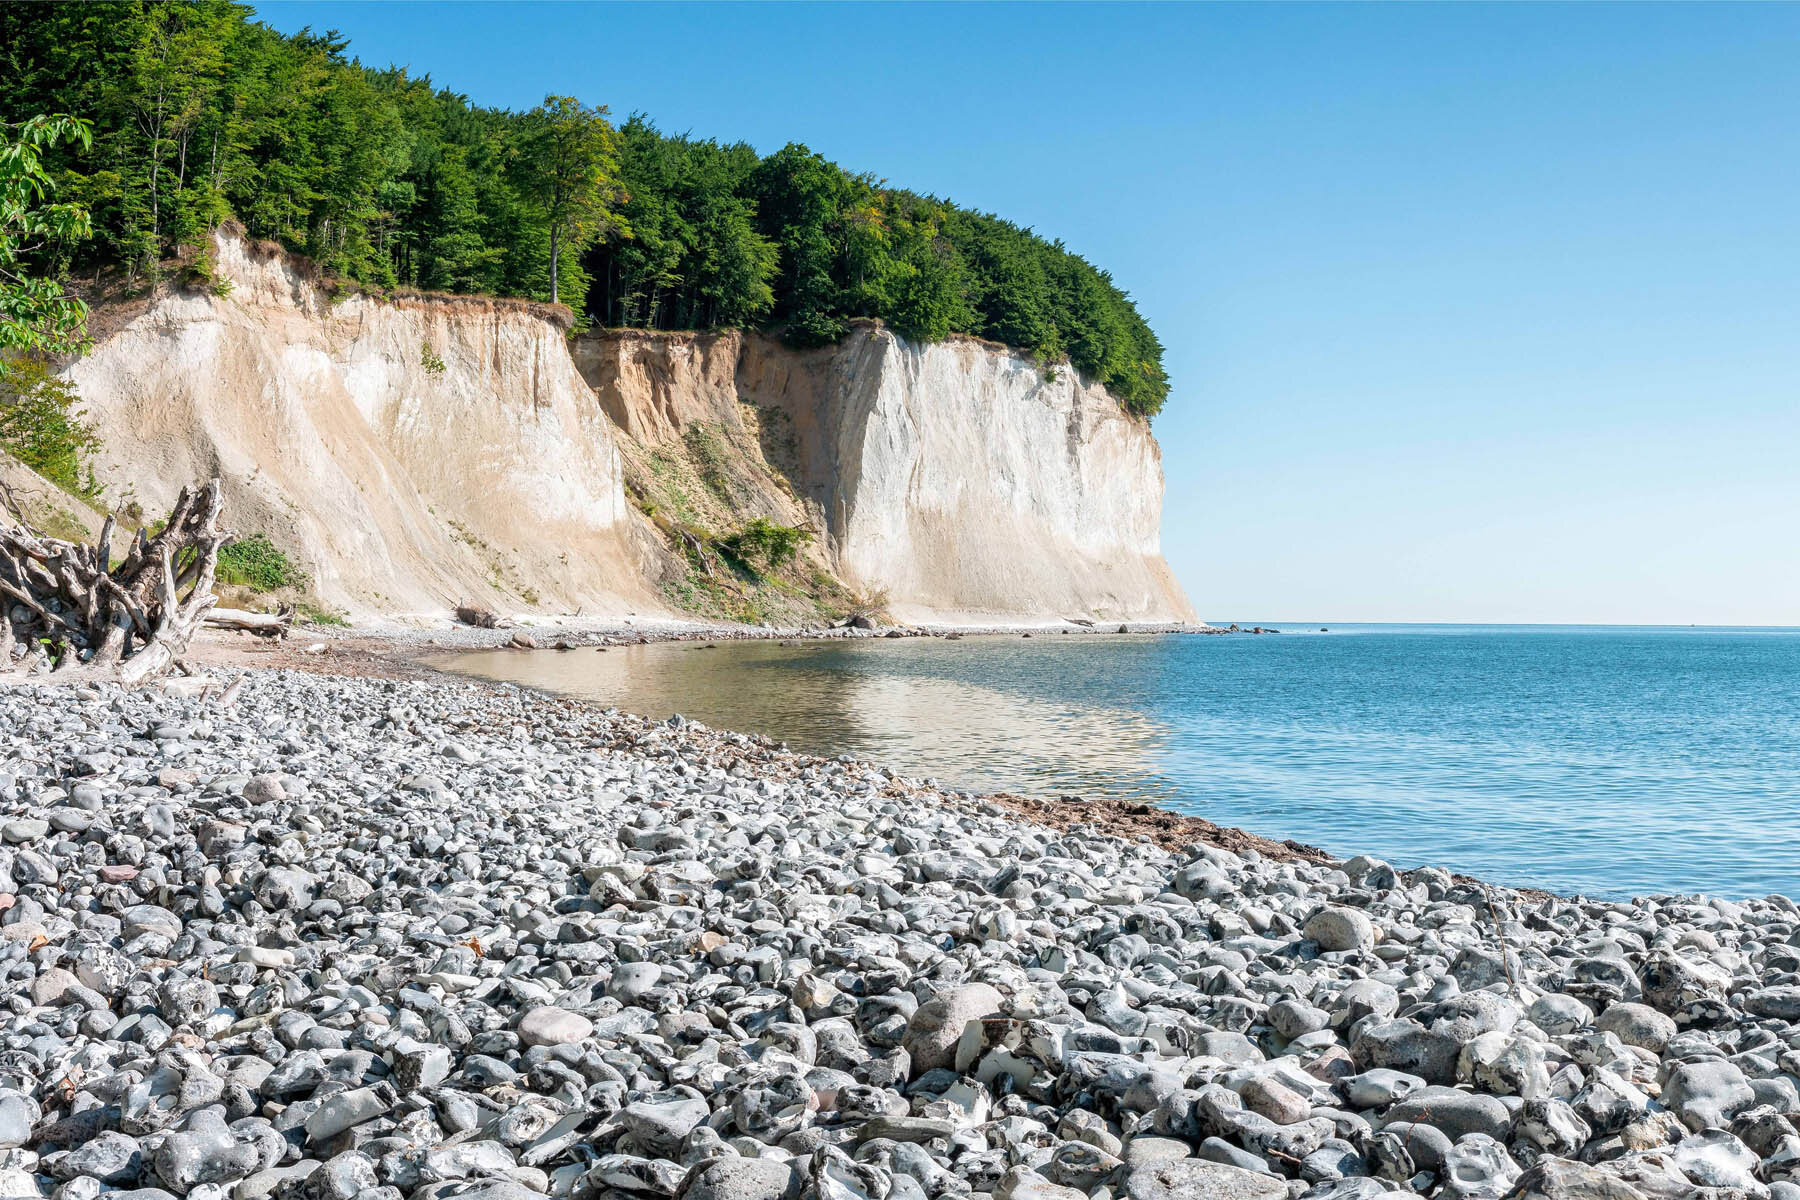 PlateART Duschrückwand mit Motiv Strand und Meer Rügen